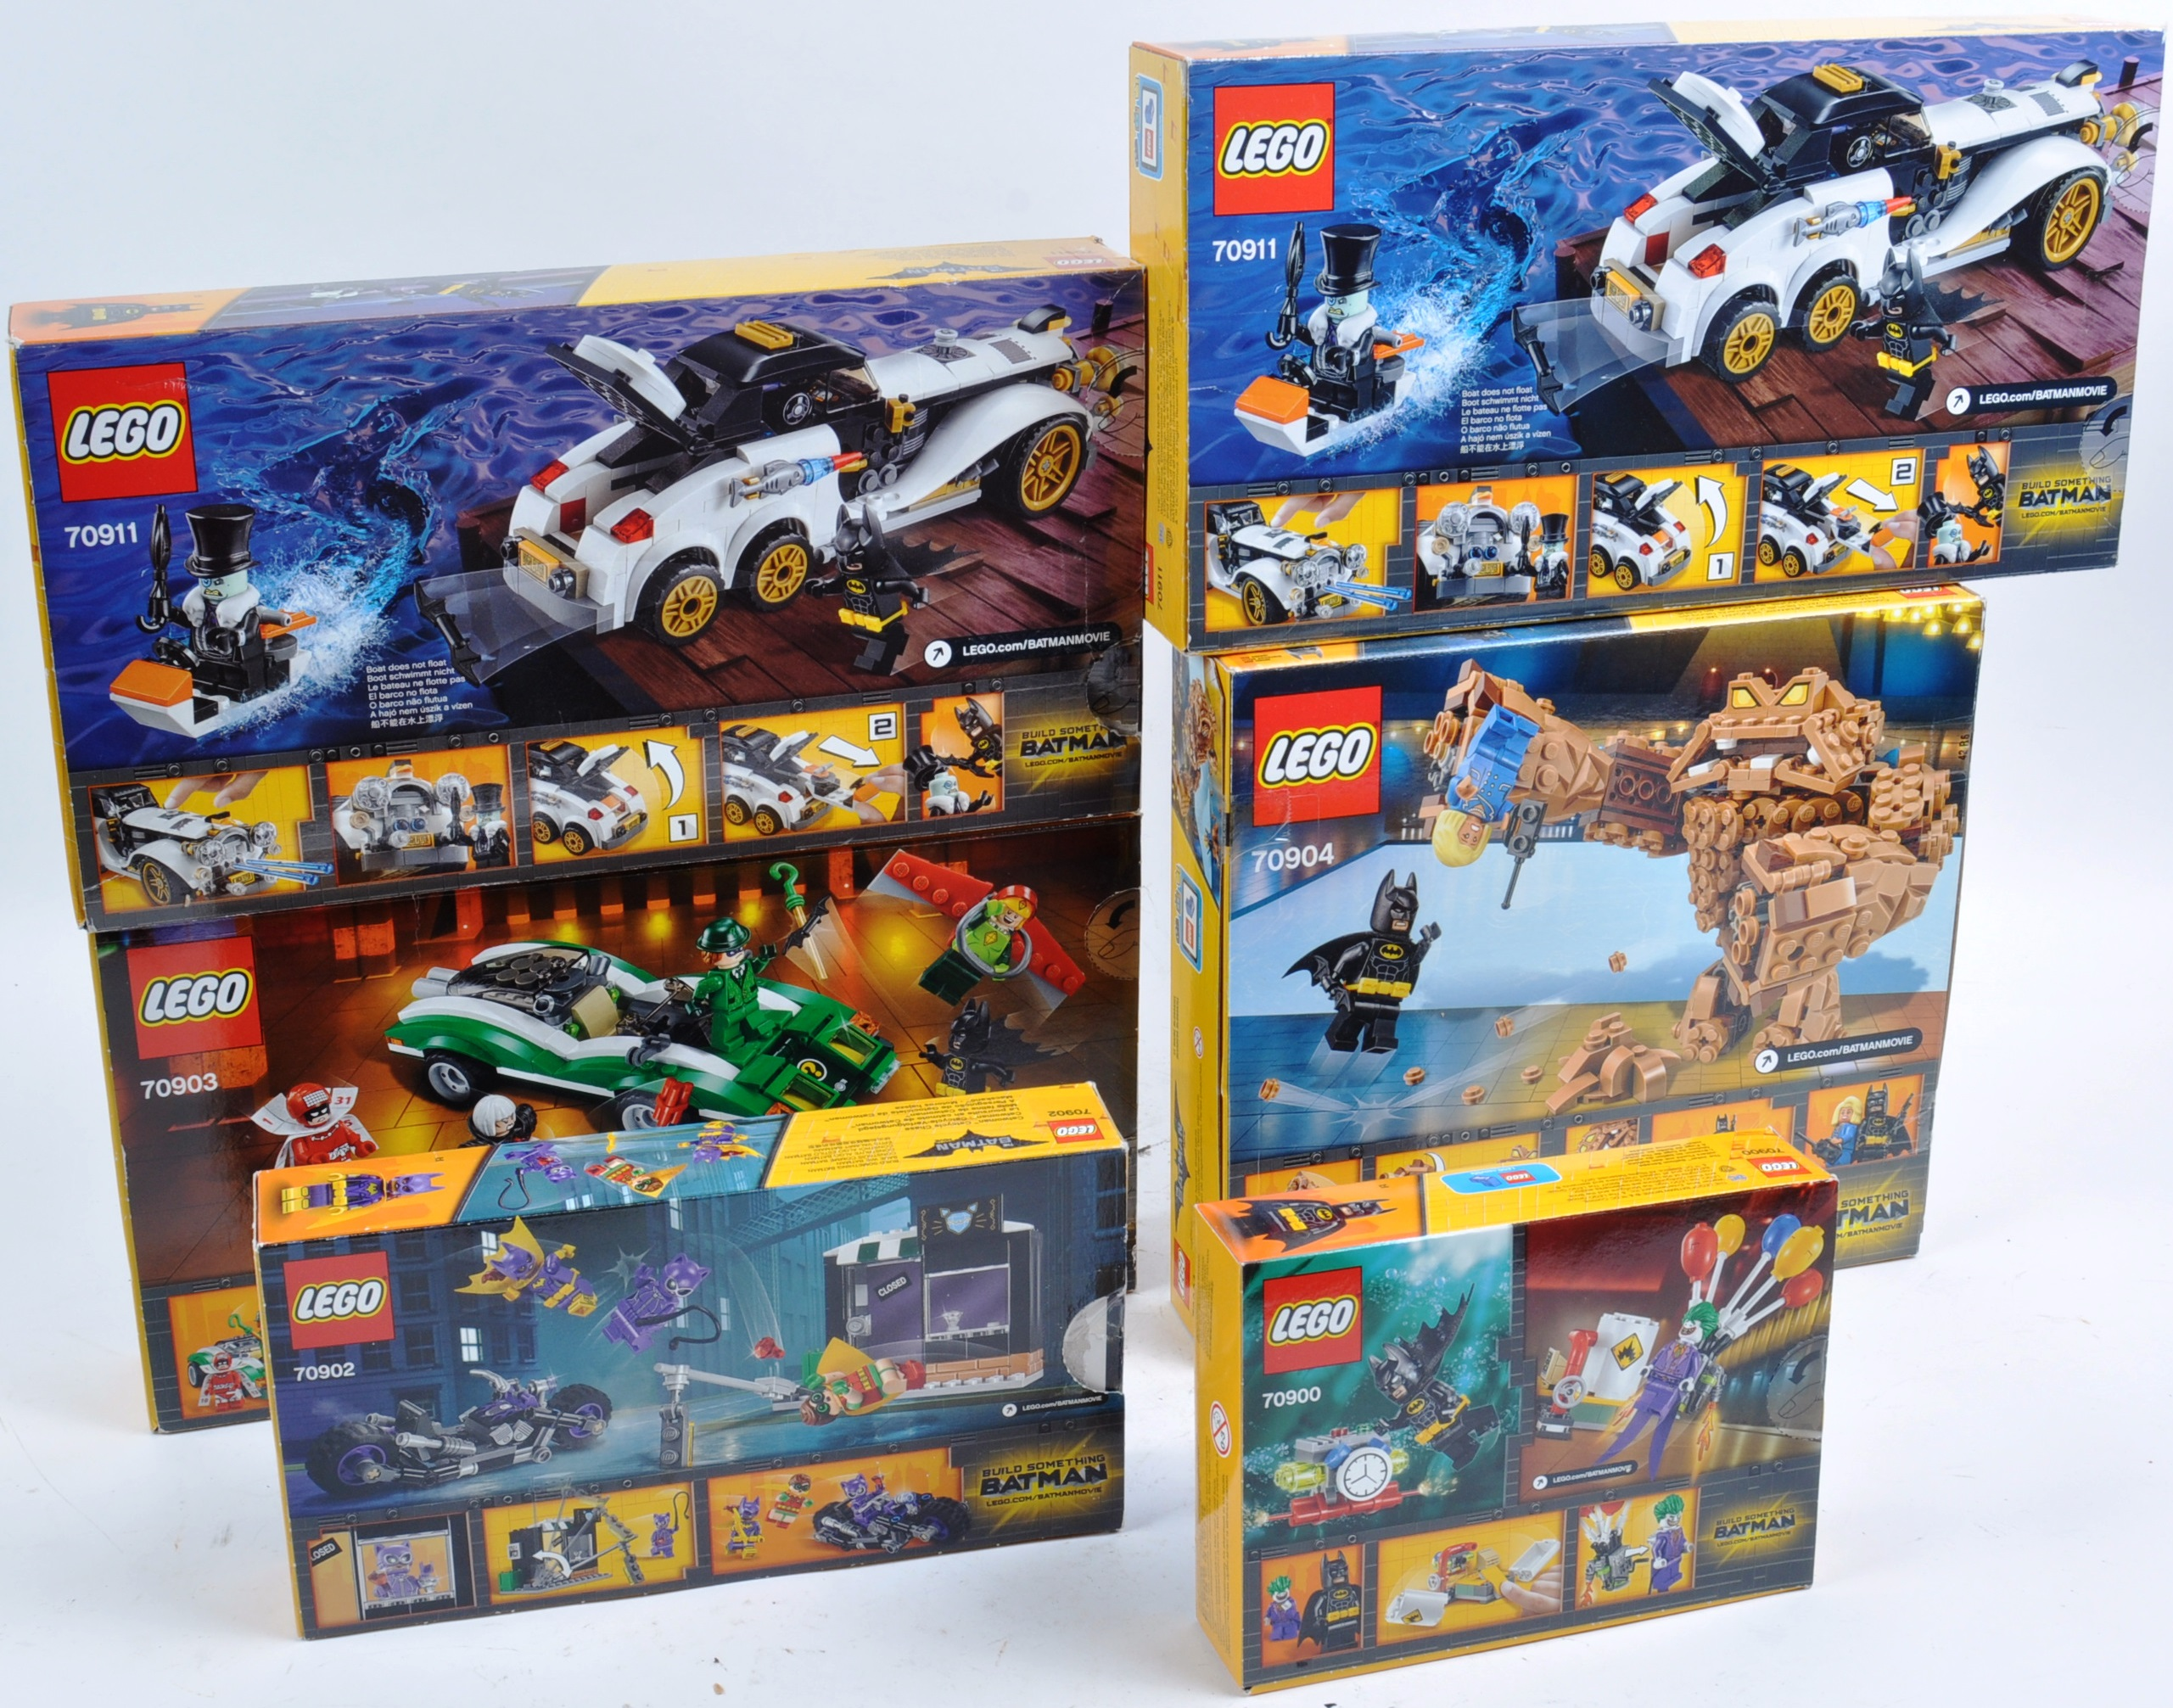 LEGO SETS - THE BATMAN MOVIE - Image 5 of 6